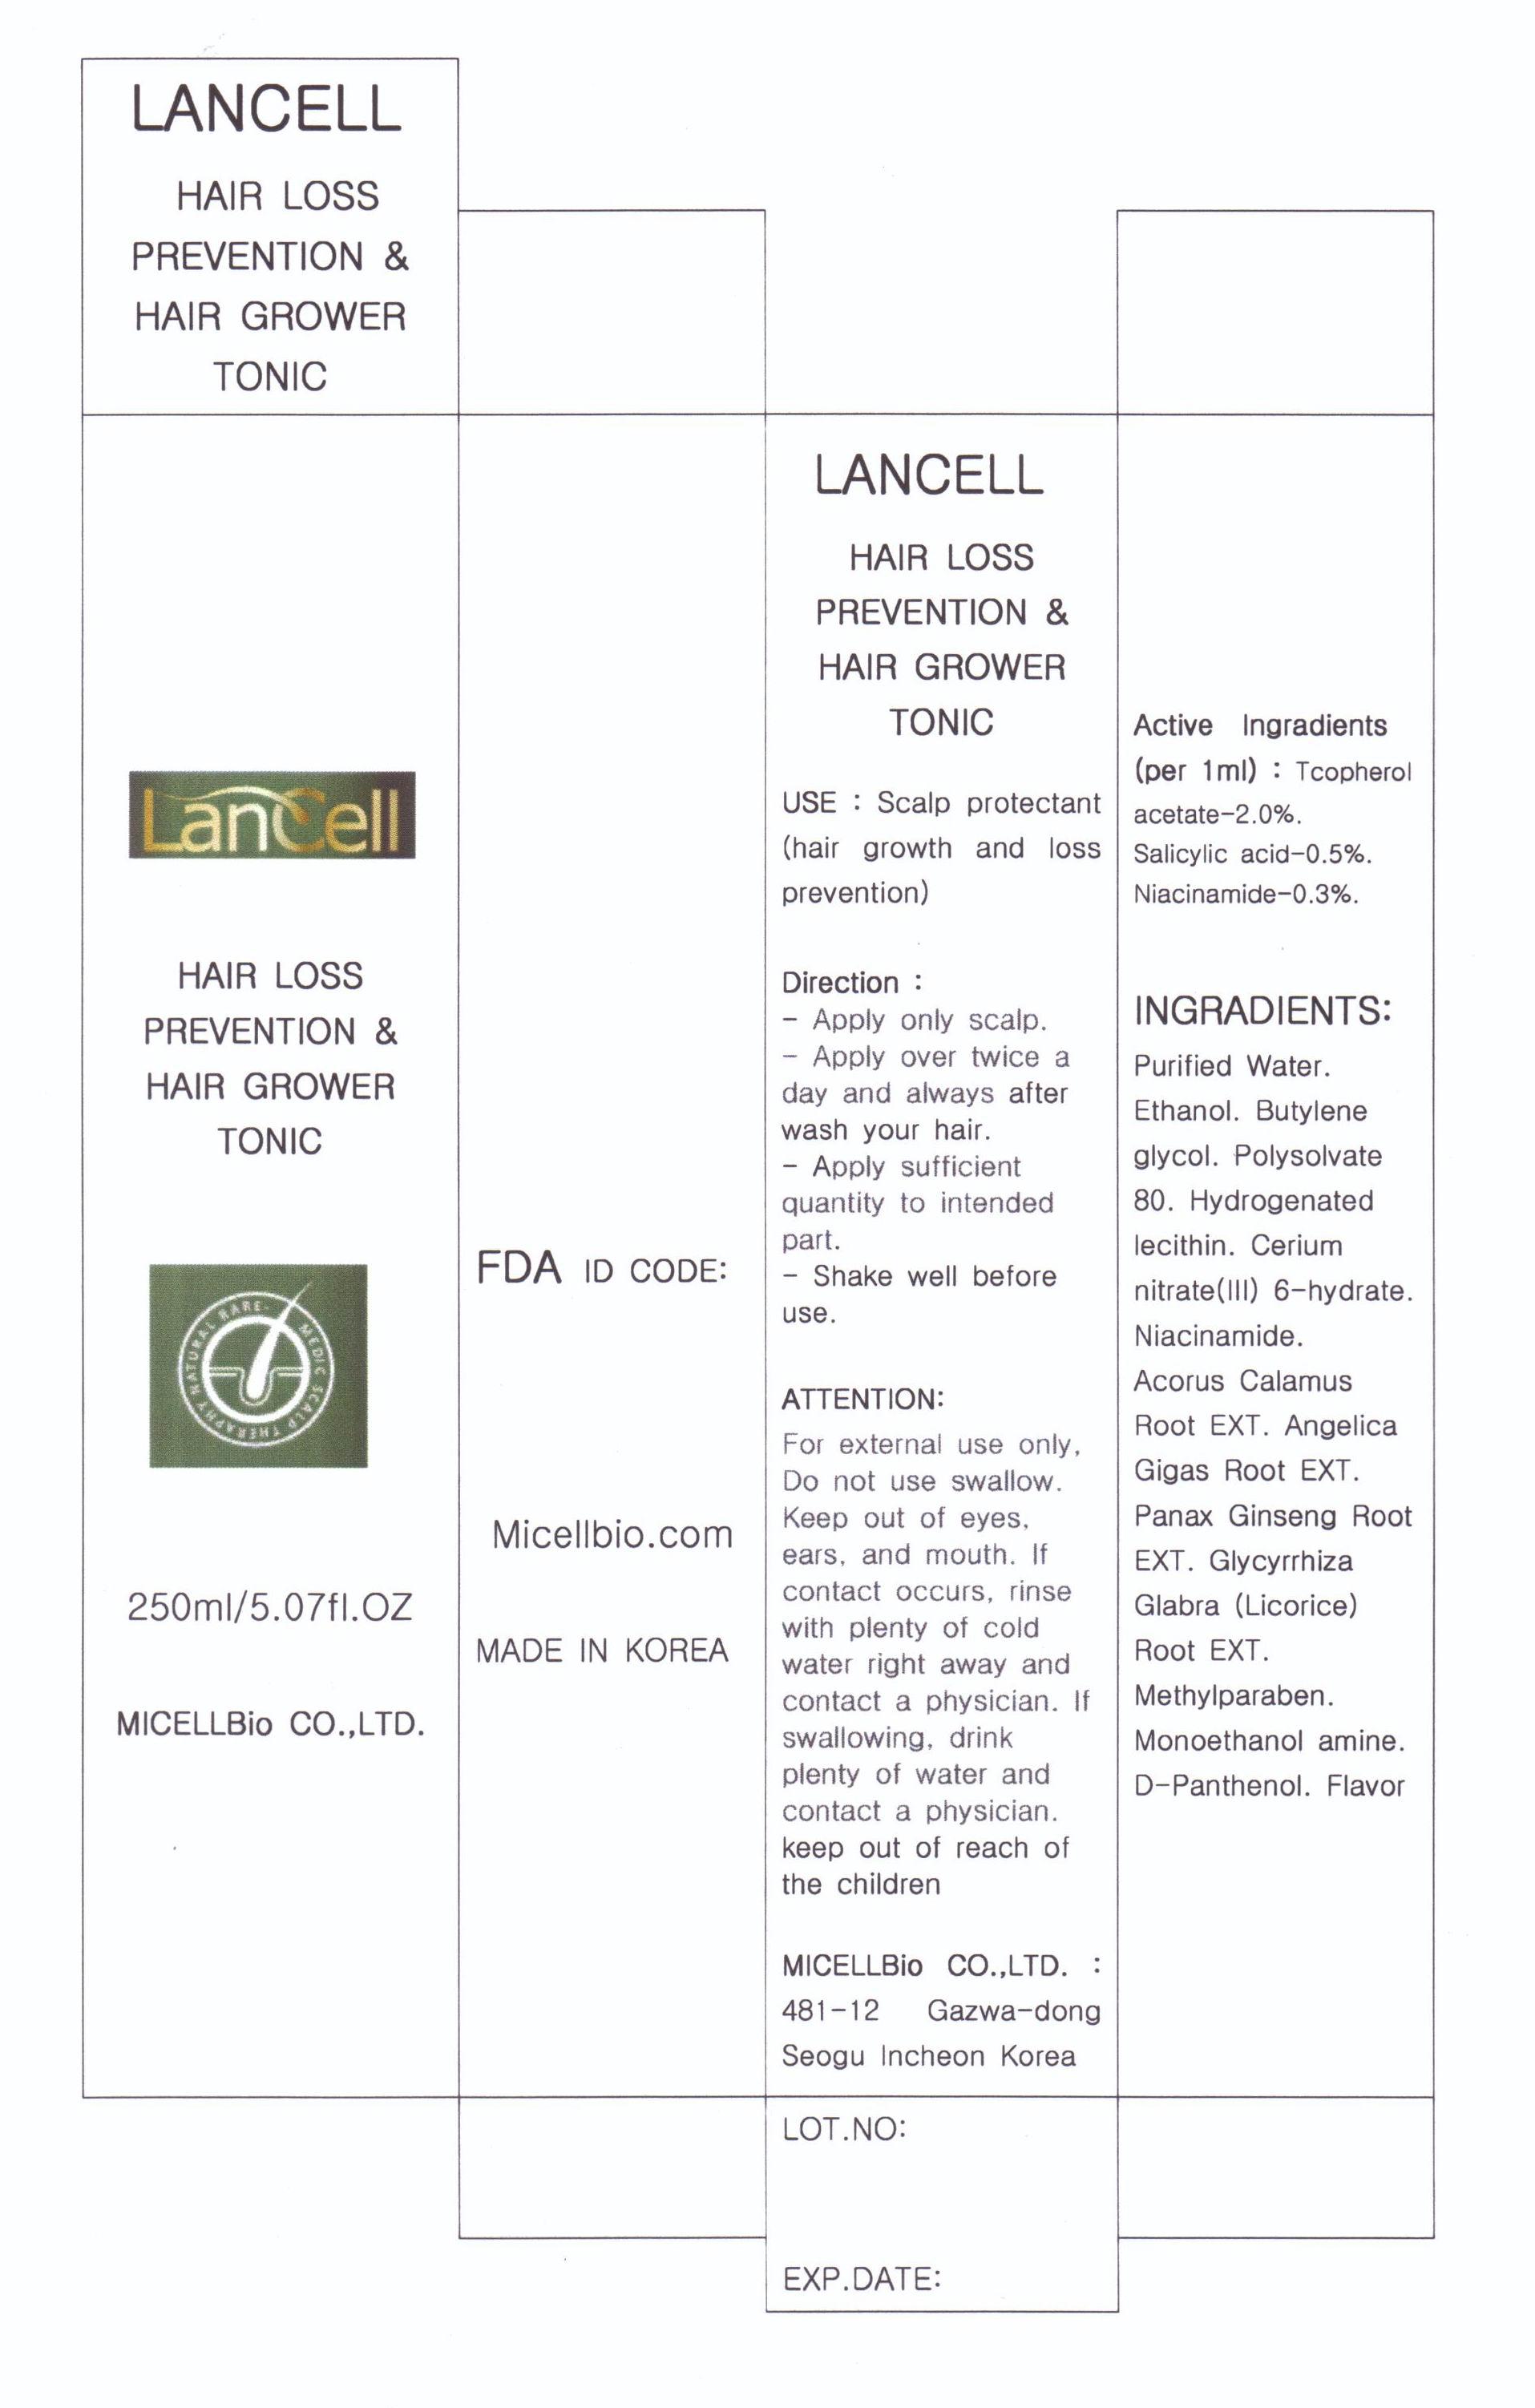 Lancell Hair Loss Prevention Hair Grower Tonic (Salicylic Acid) Liquid [Micellbio Co., Ltd]